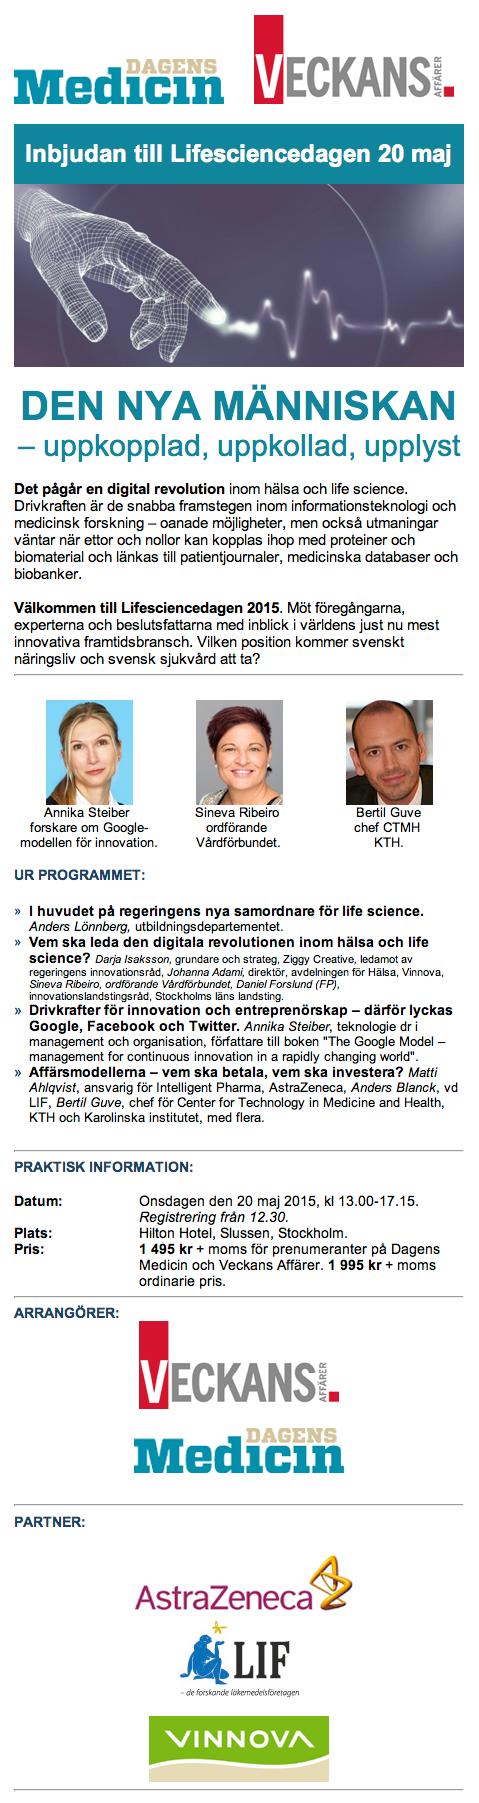 LifeScience-dagen 20 maj 2015